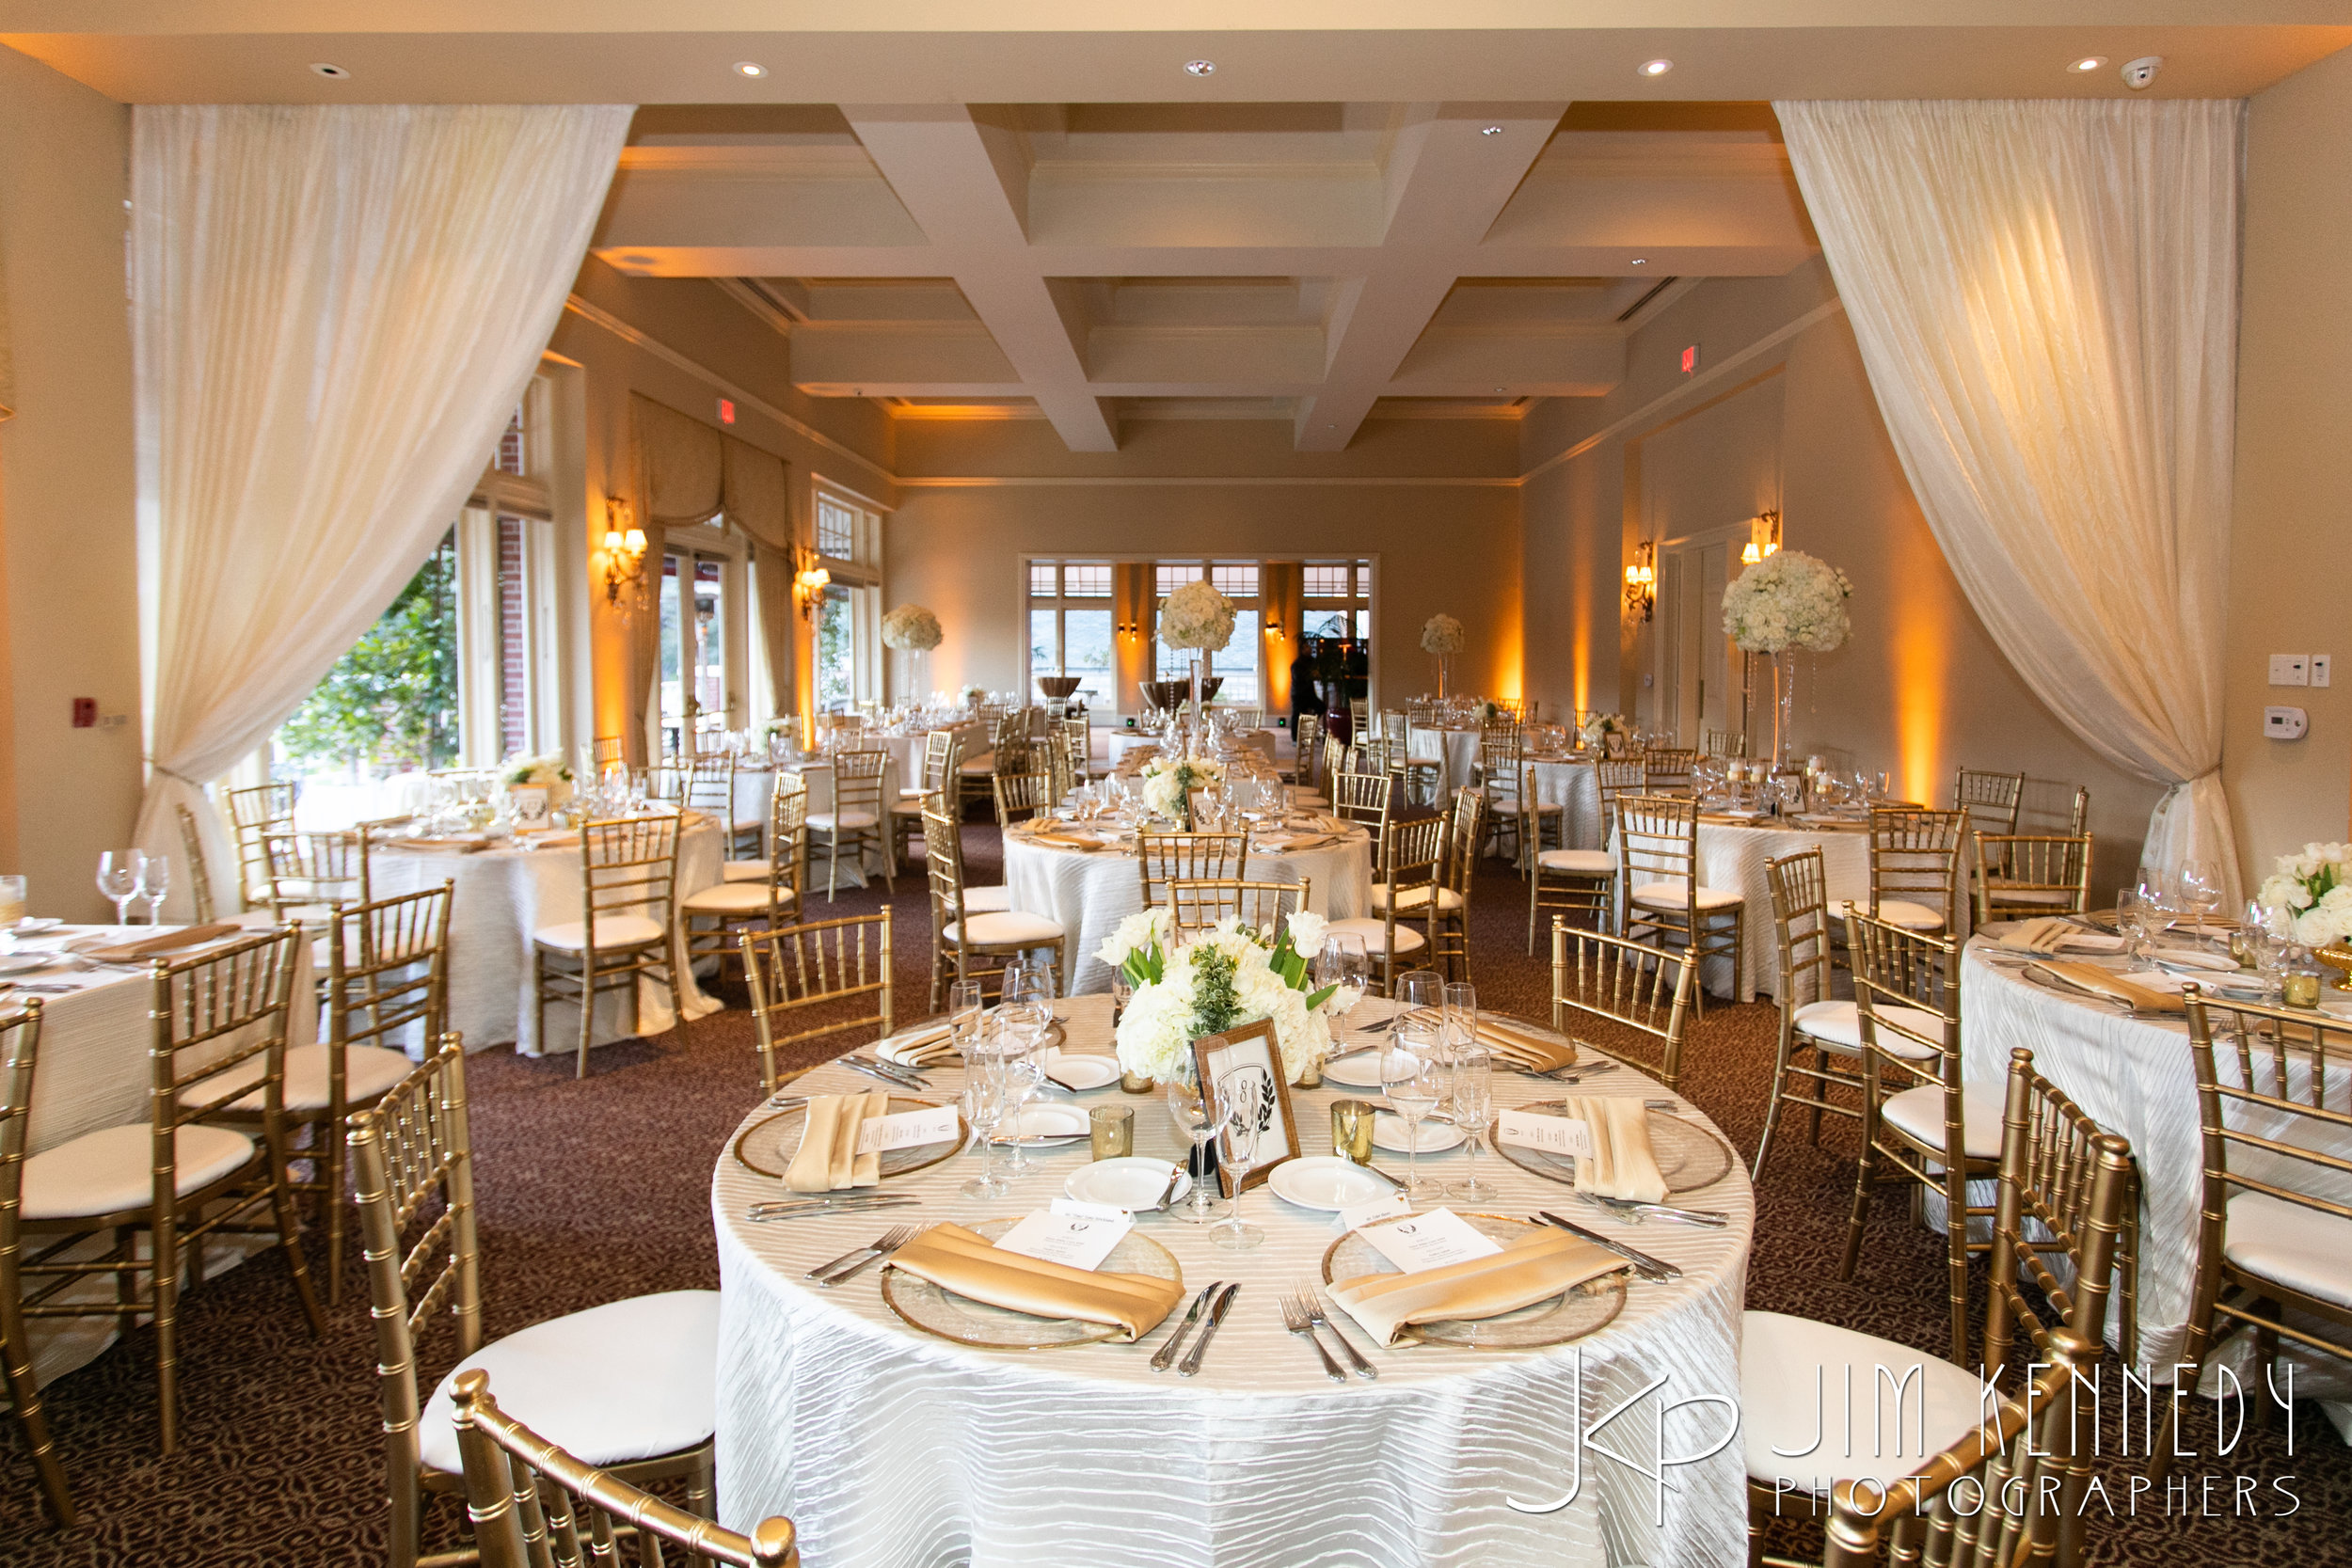 sherwood_country_club_wedding-2096.jpg